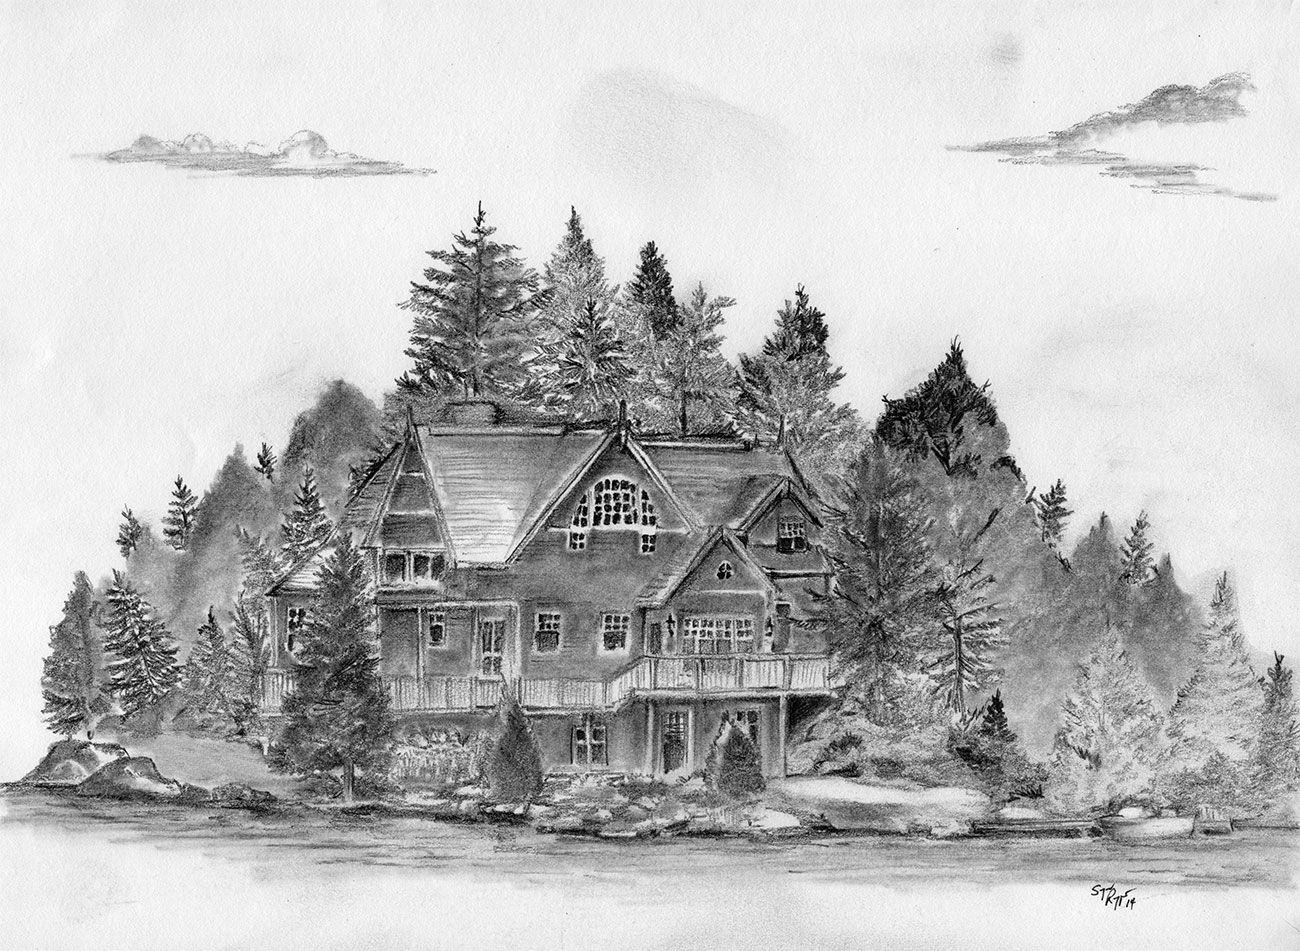 Cottage Lake Pencil Sketch Normal Sketchpad Paper Landscape Drawings